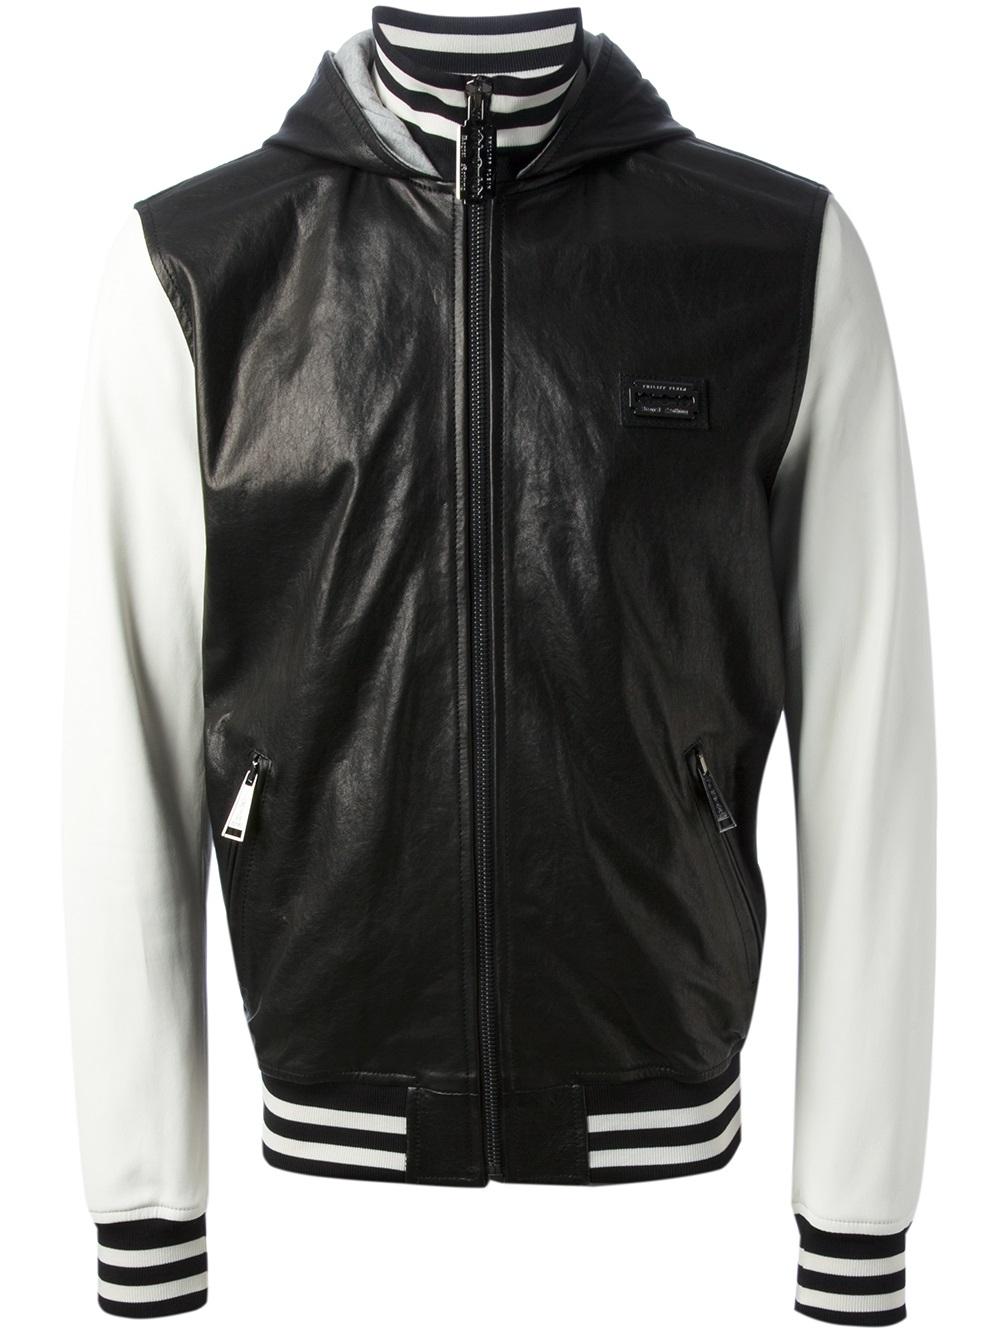 philipp plein varsity jacket in black for men lyst. Black Bedroom Furniture Sets. Home Design Ideas